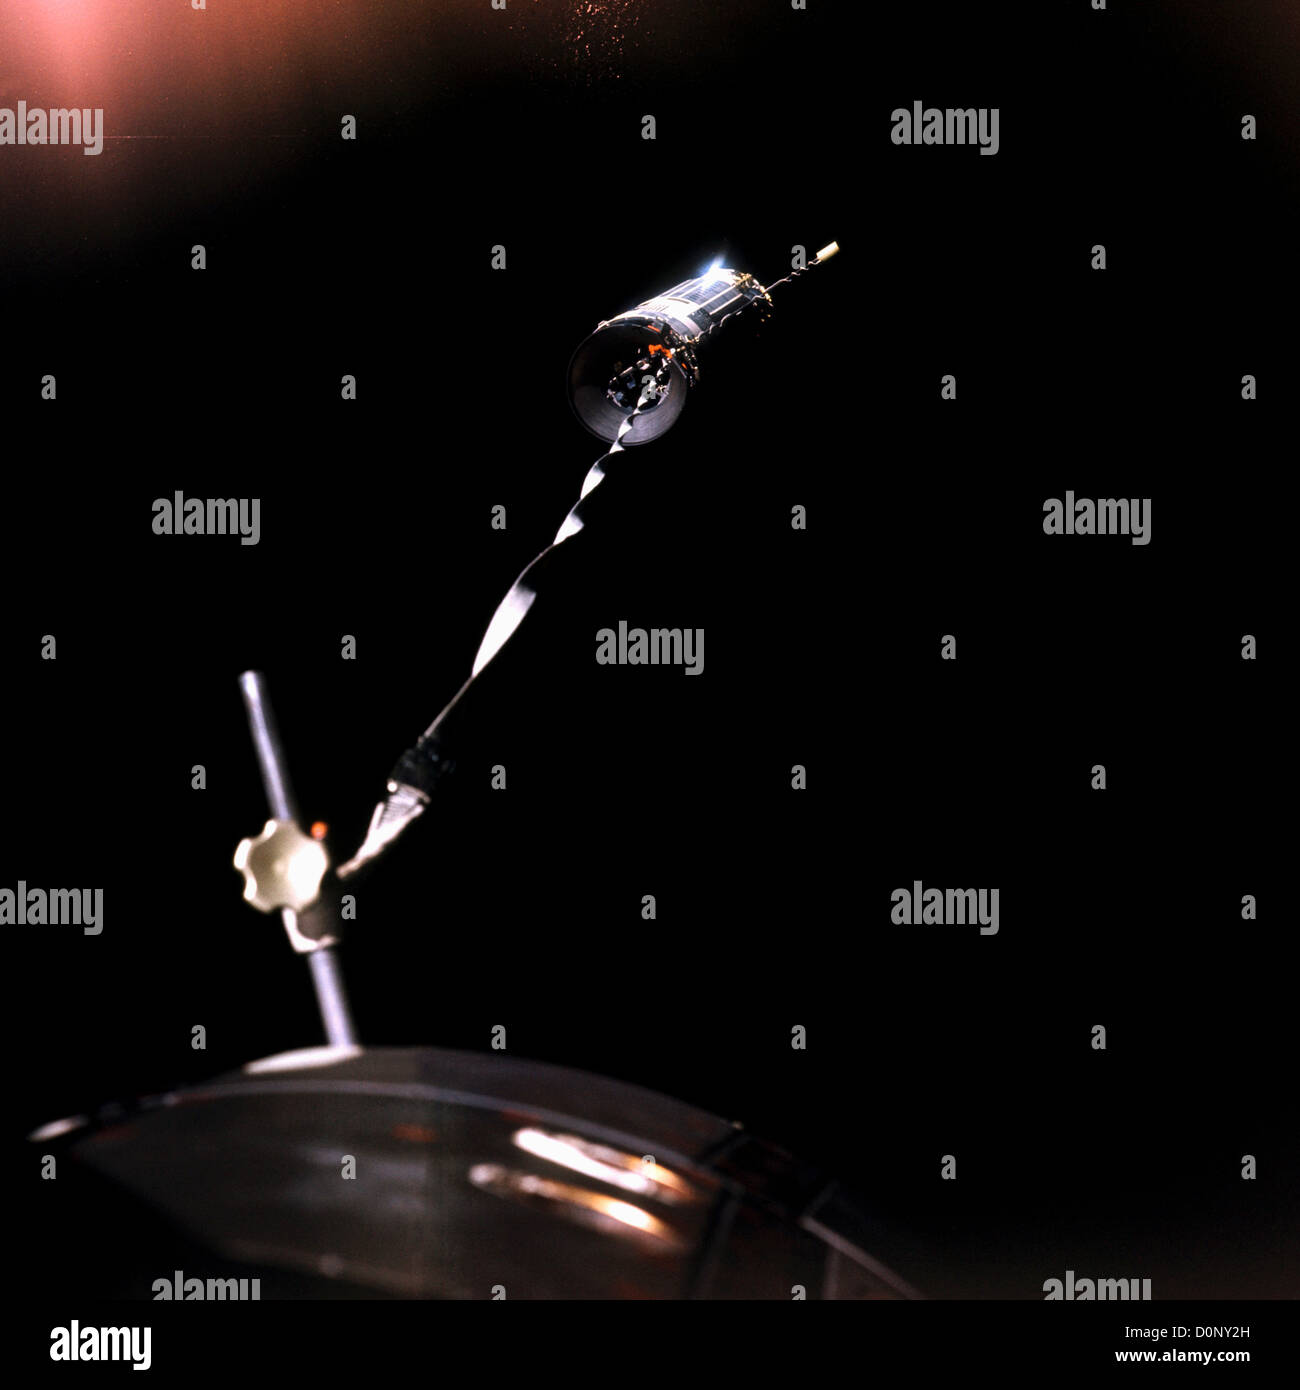 Agena Rocket Tethered to Gemini 12 - Stock Image